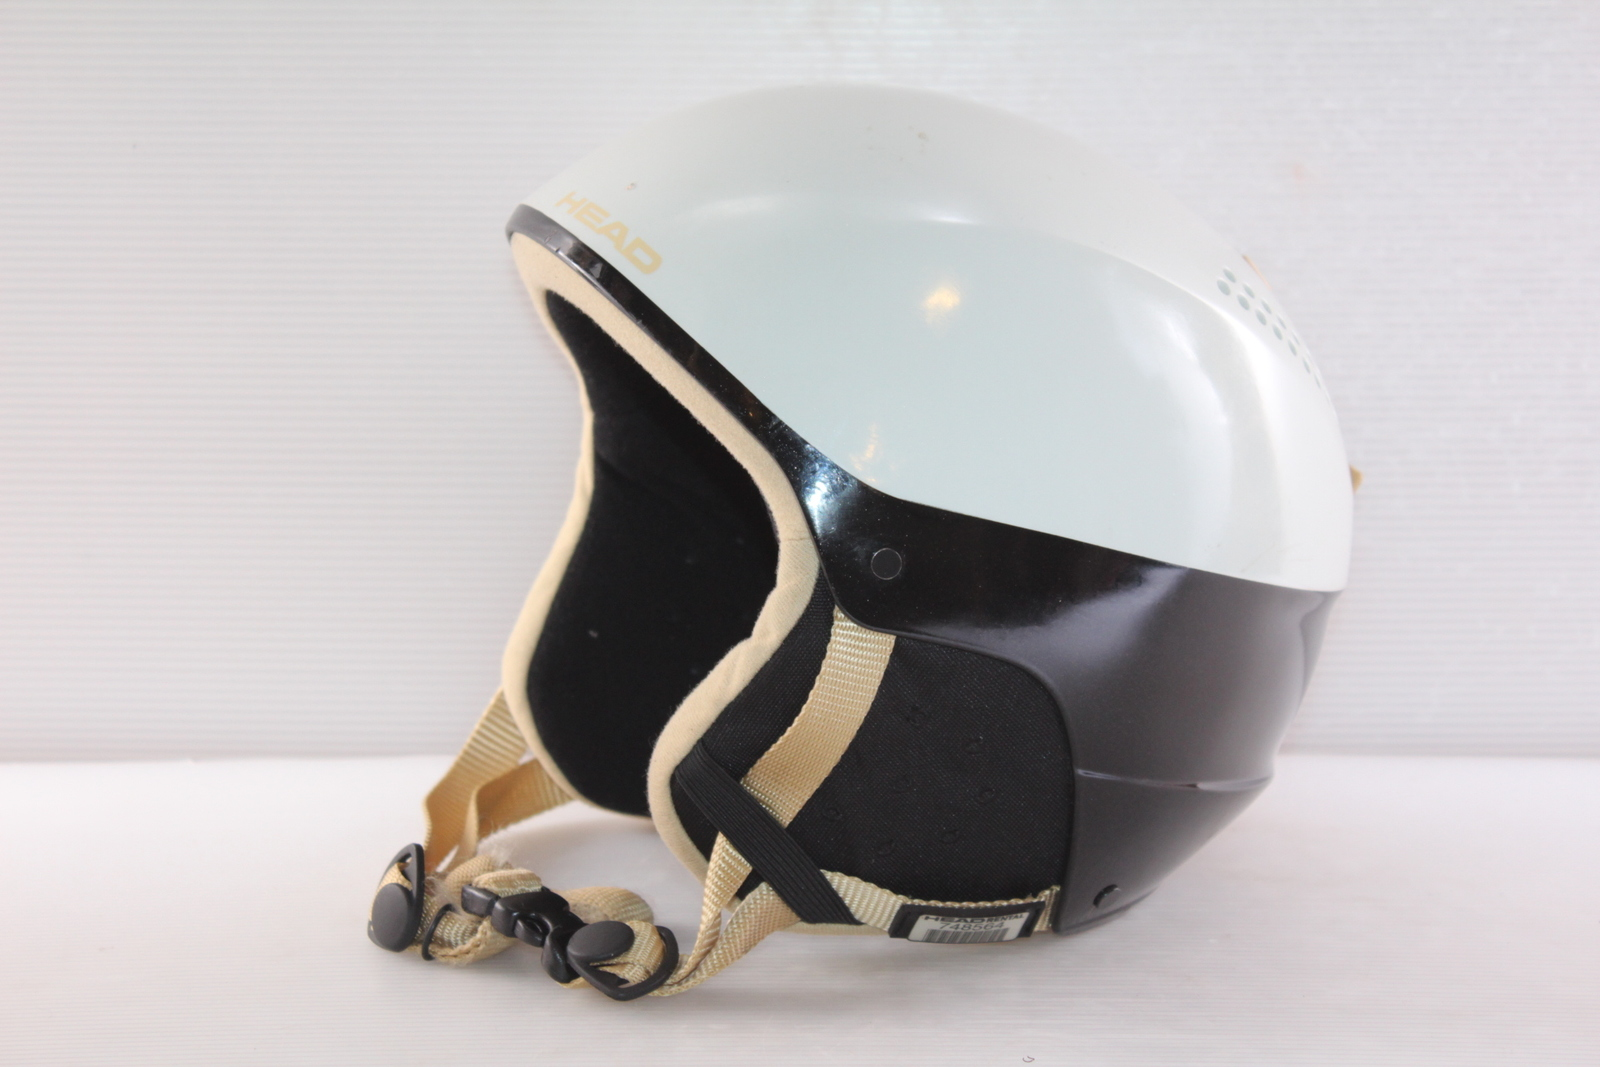 Dámská lyžařská helma Head Ventor Pro R - posuvná vel. 56 - 59